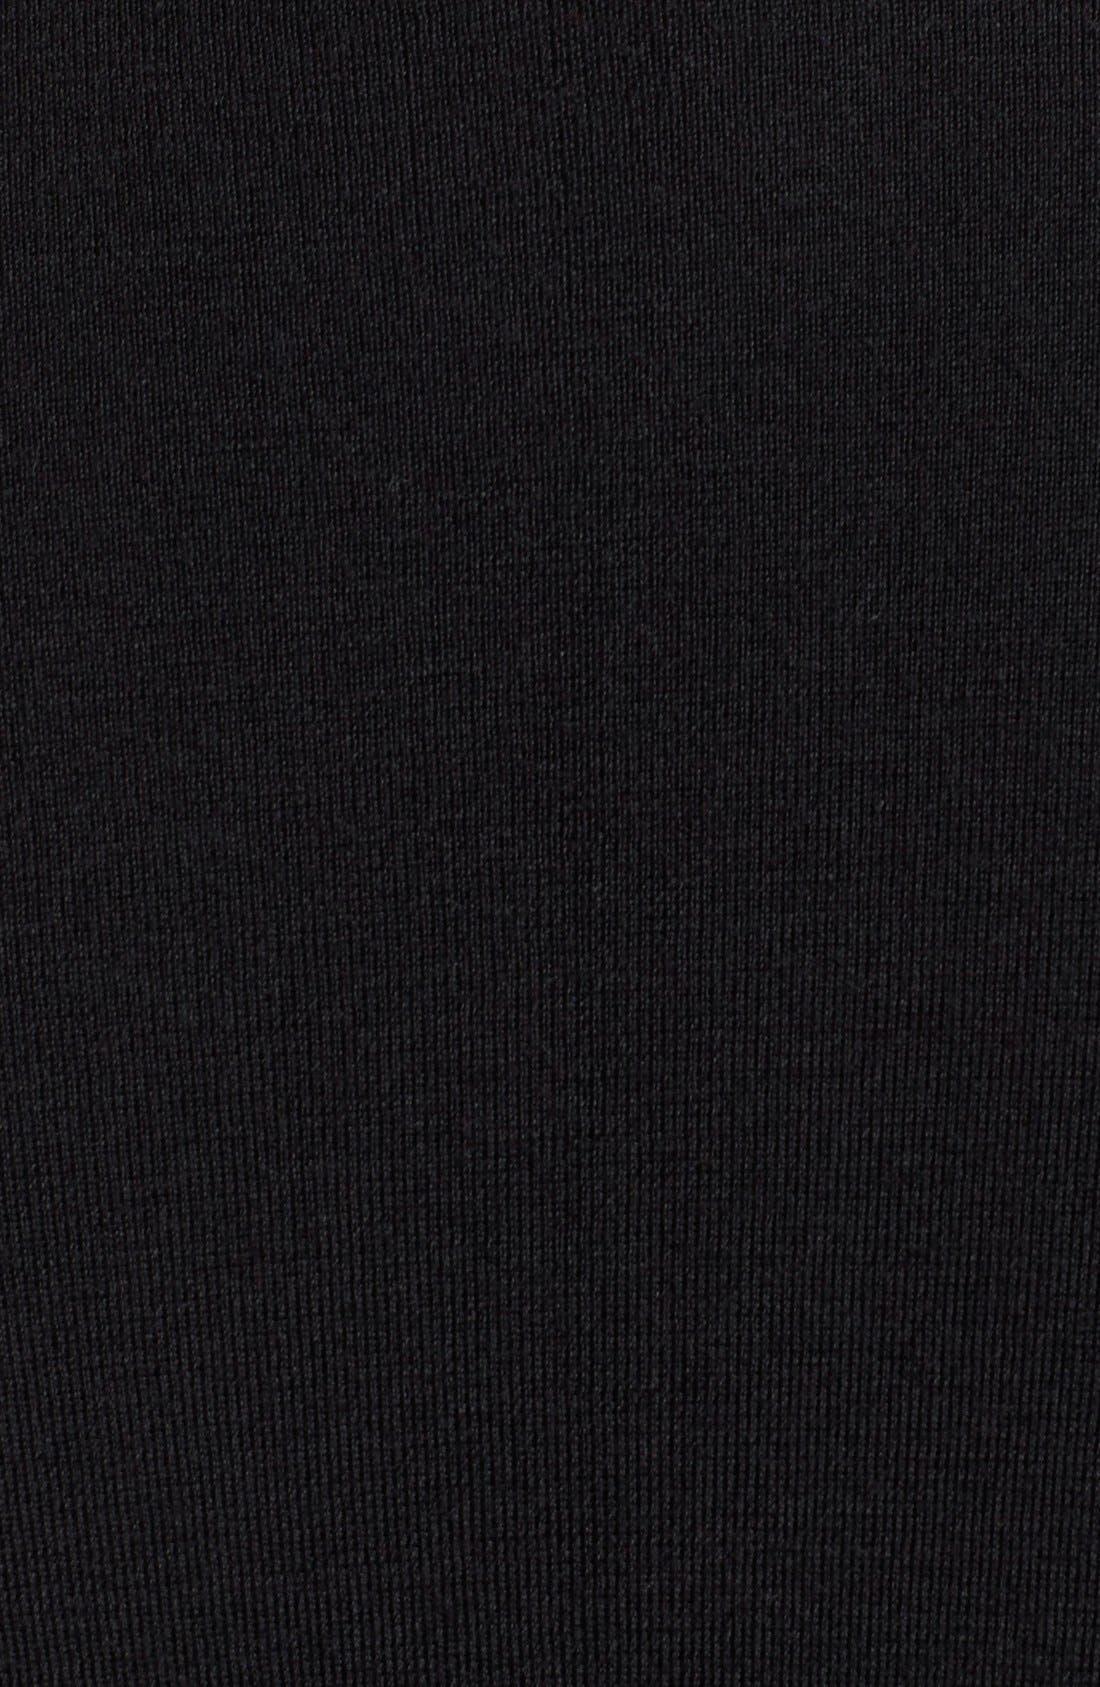 Draped Wool Knit Cardigan,                             Alternate thumbnail 9, color,                             BLACK